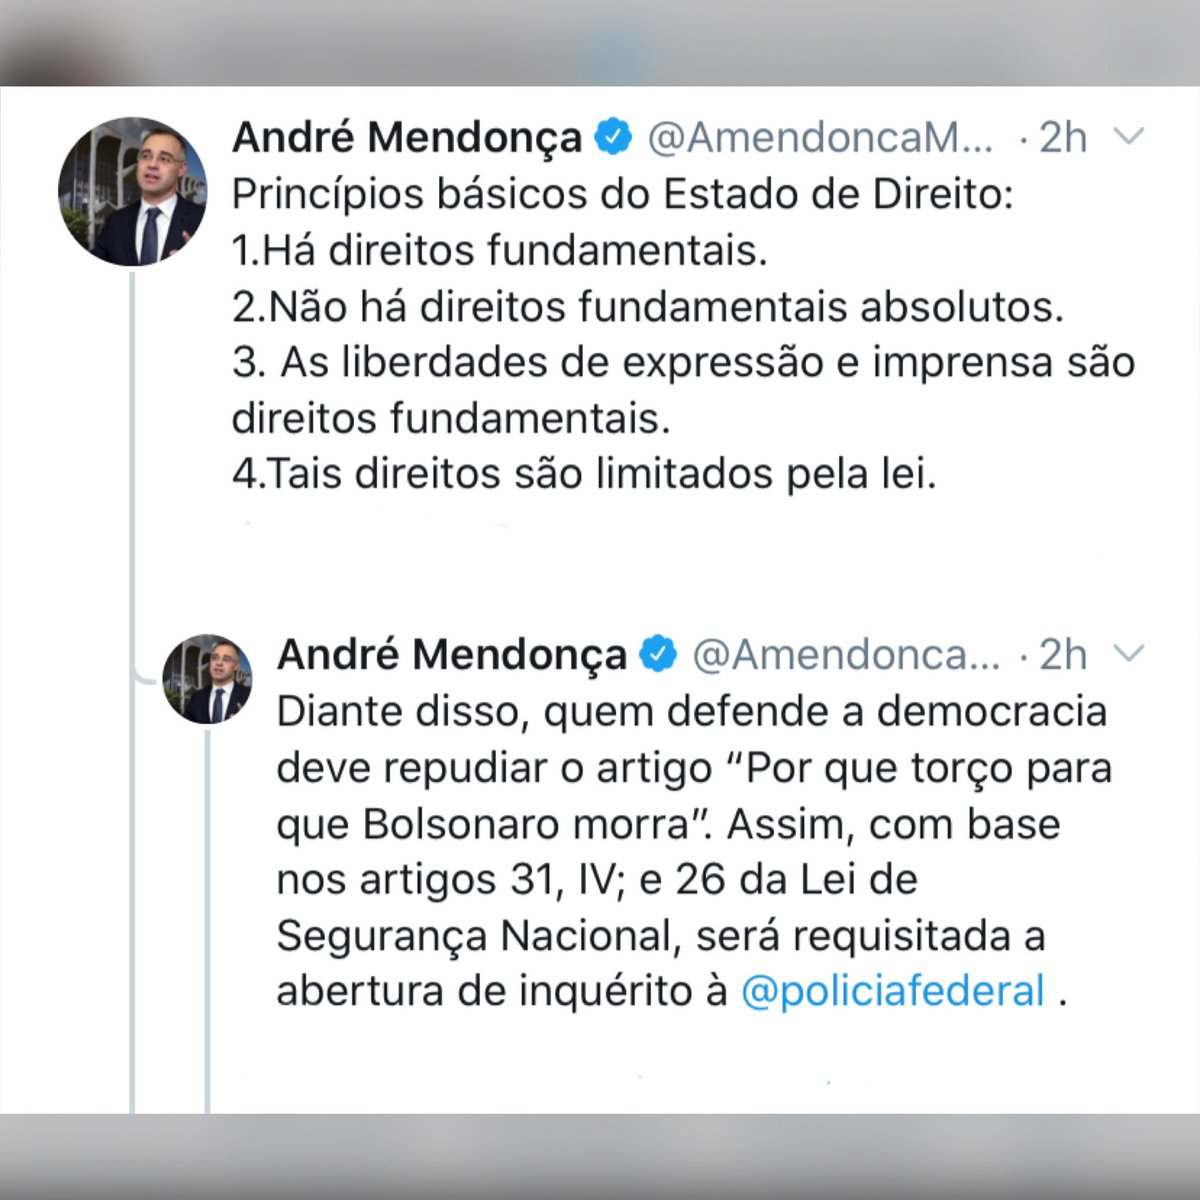 RT @jairbolsonaro: - @AmendoncaMJSP @AmendoncaMJSP https://t.co/IplARQ6k4J